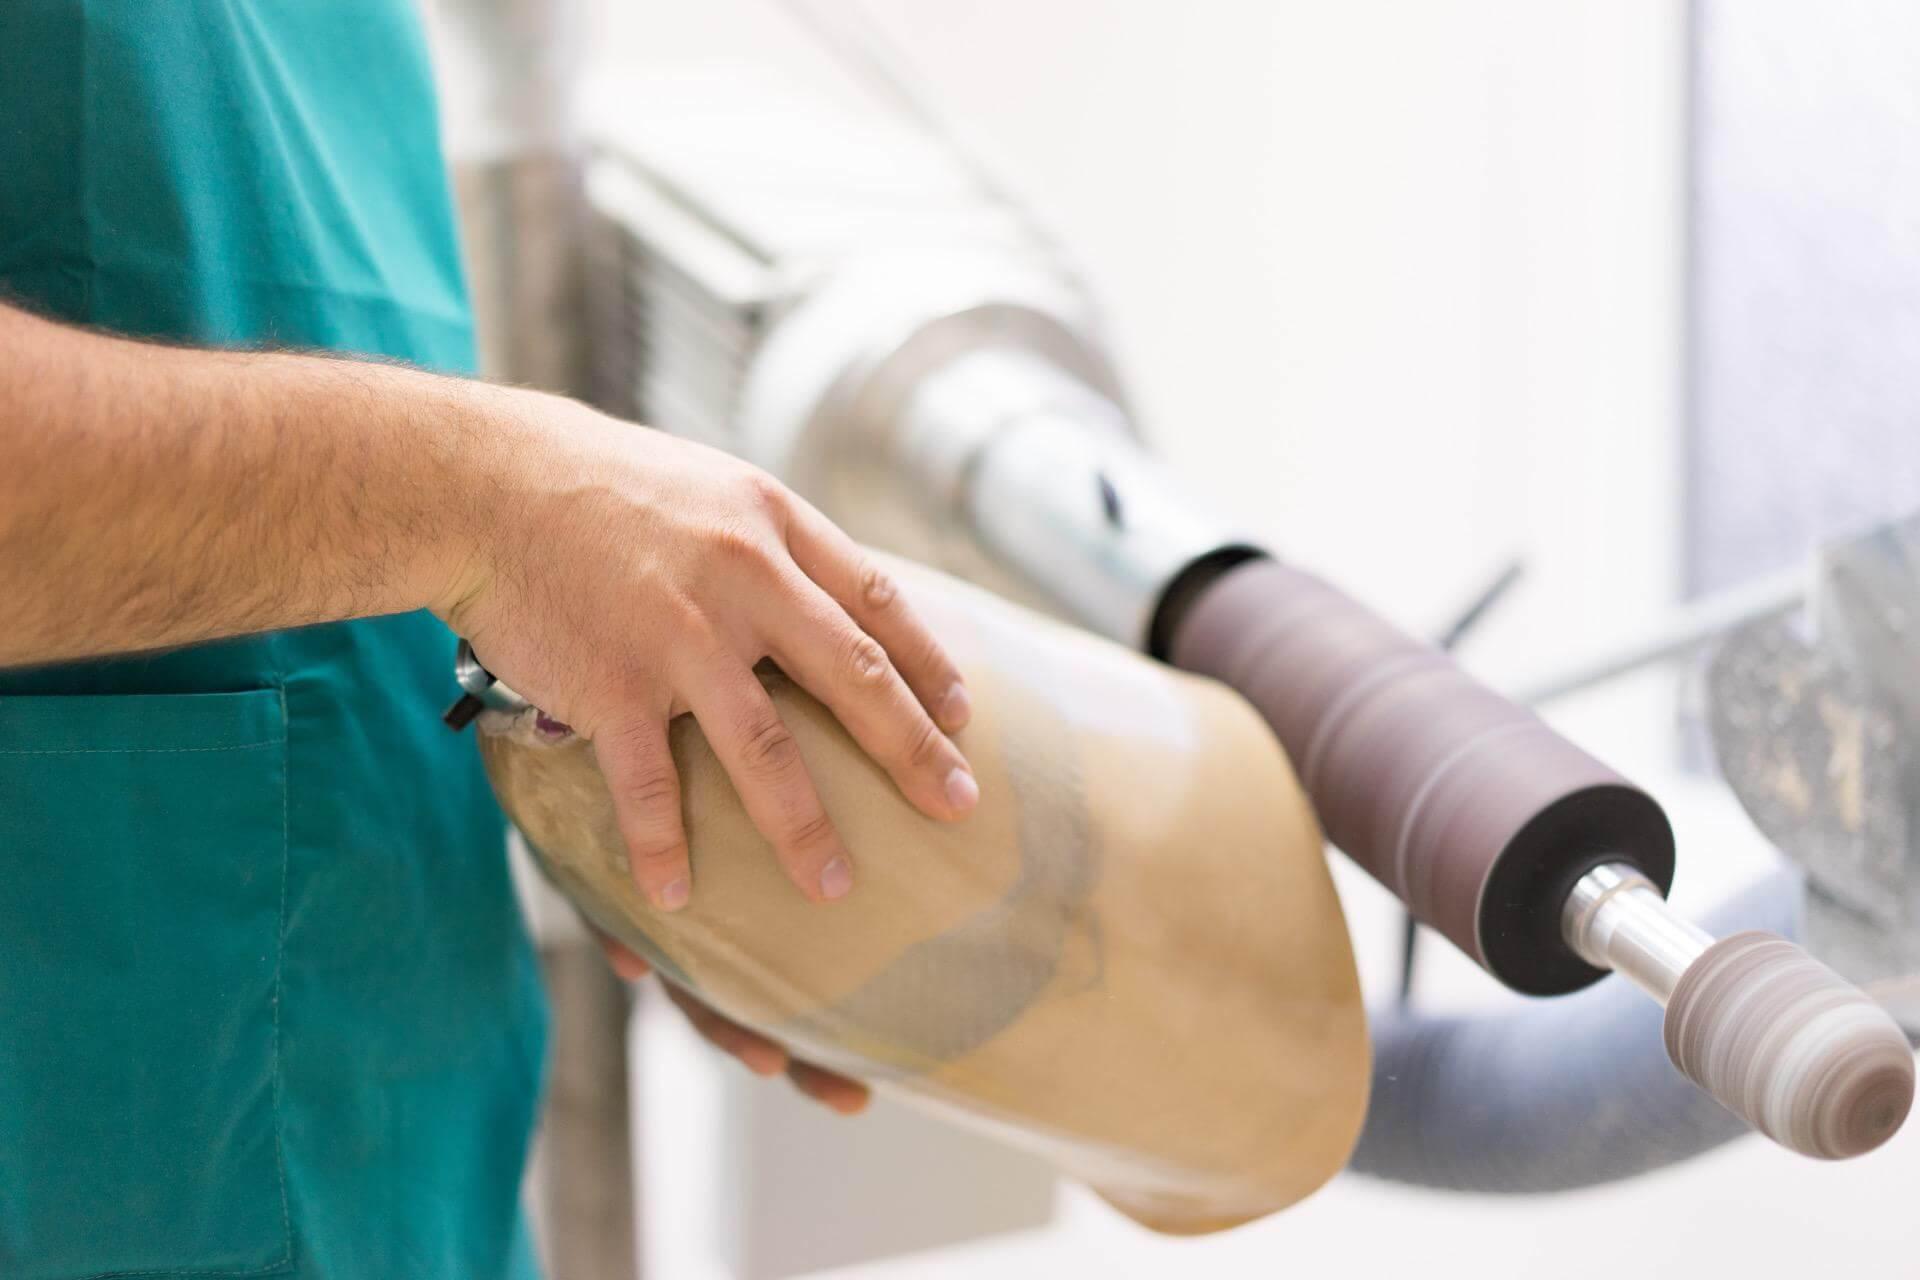 правене и изработка на протеза за крак - Ортомедикс